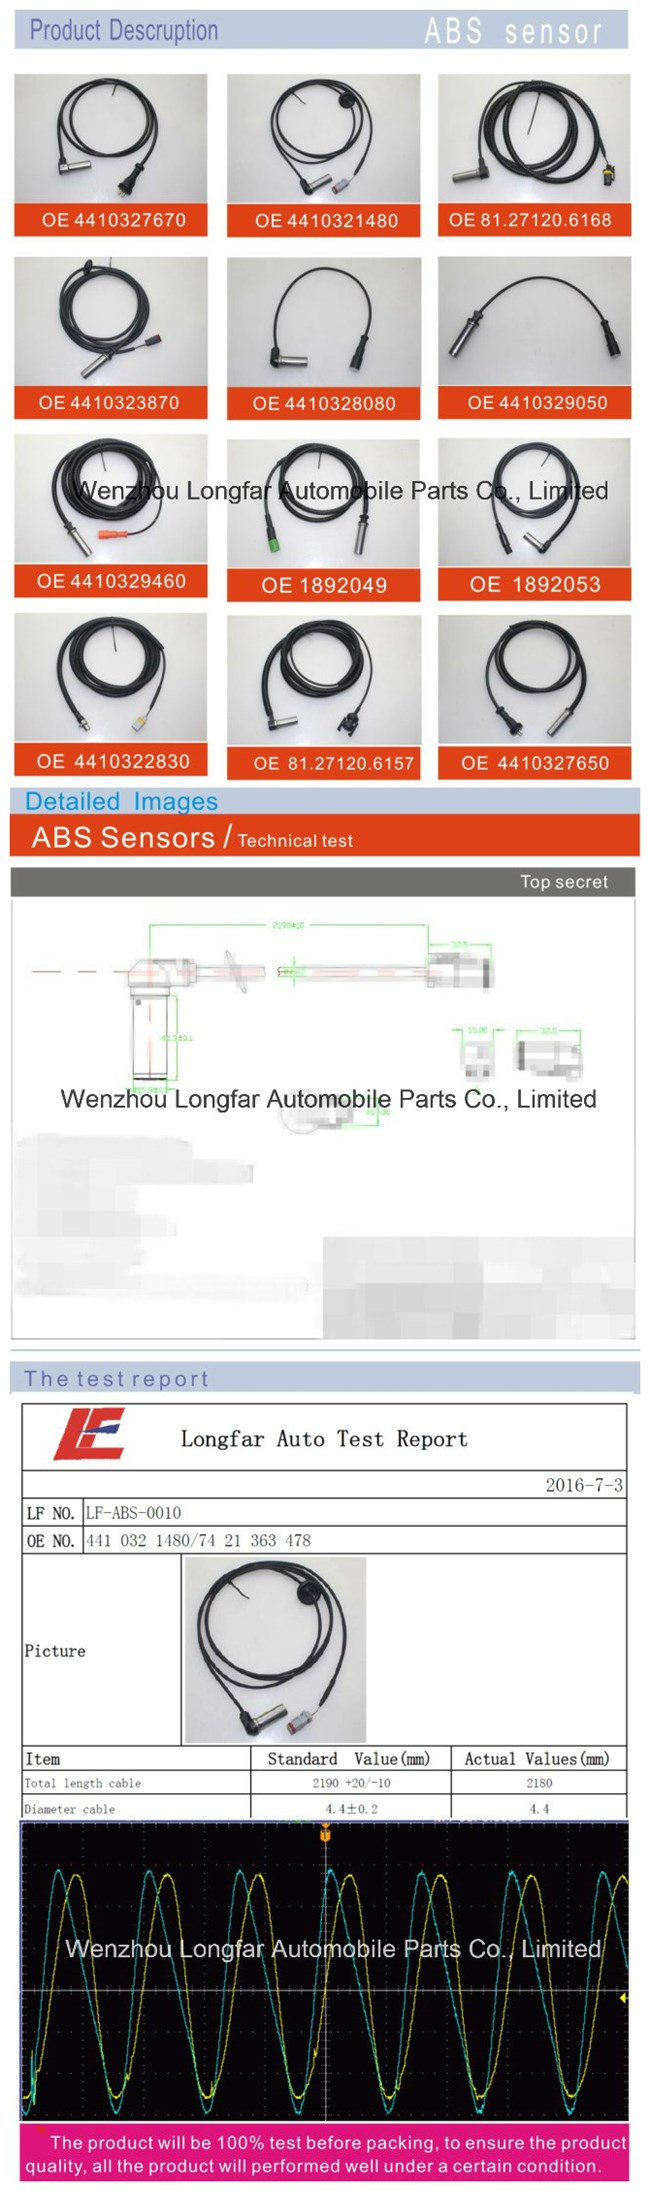 Auto Camshaft Position Sensor Cylinder Identification Transducer Indicator Sensor 96325867,7517521,83.439,EPS396,33124 for Daewoo,Chevrolet,Kaishin,GM,Delphi